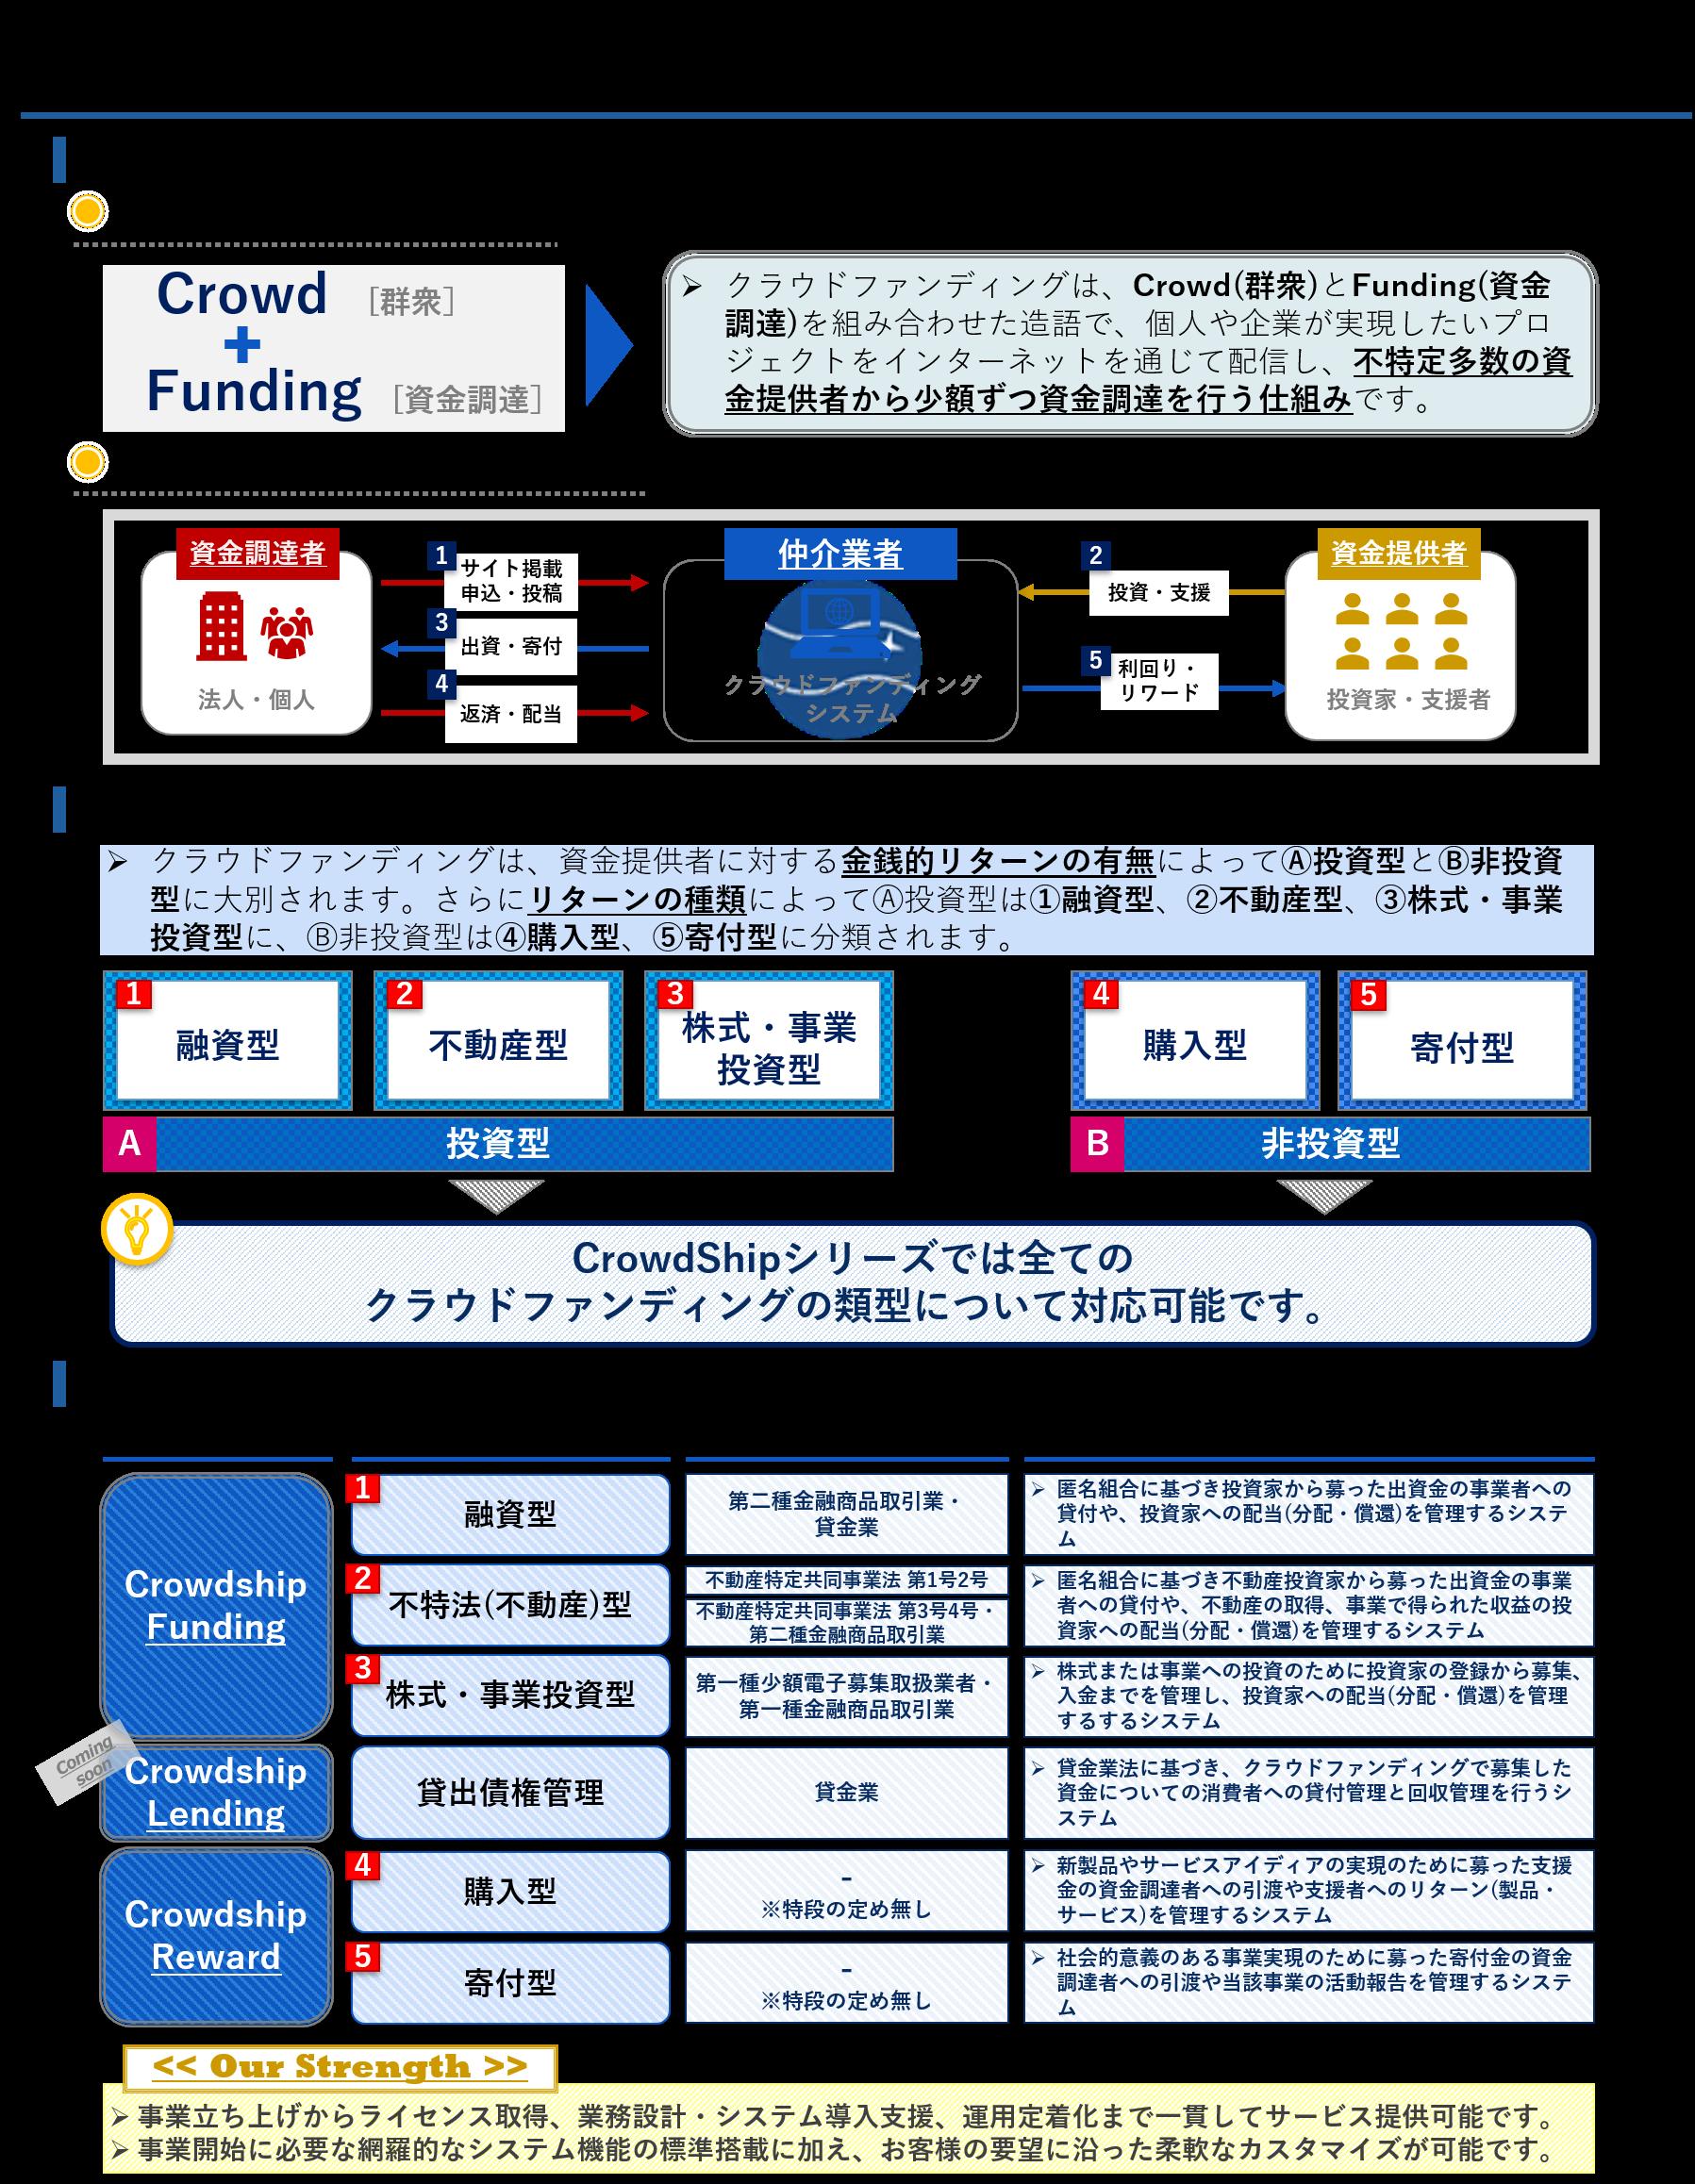 CrowdShipシリーズ 製品ラインナップ